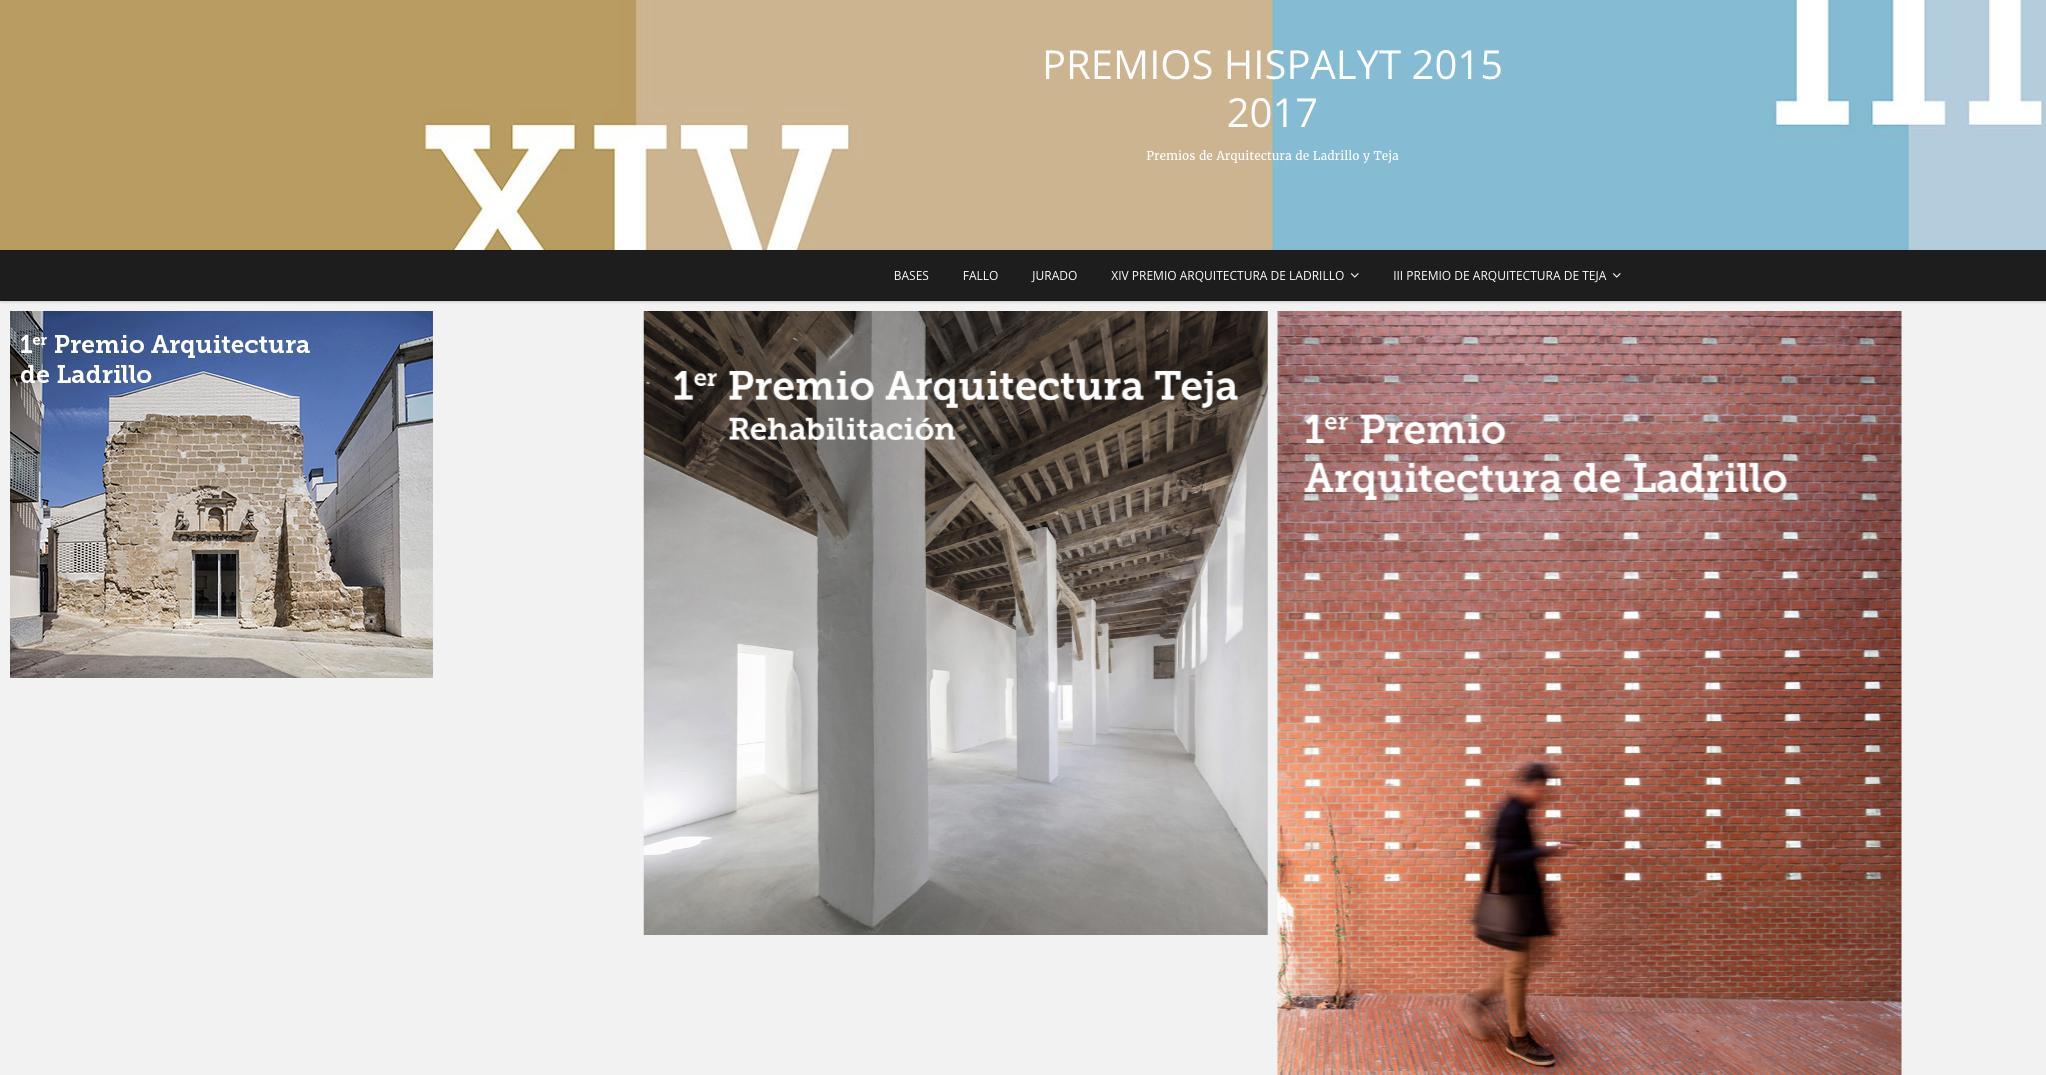 Premios de Arquitectura de Hispalyt 2015-2017, (XIV Premio de Arquitectura de Ladrillo y III Premio de Arquitectura de Teja)